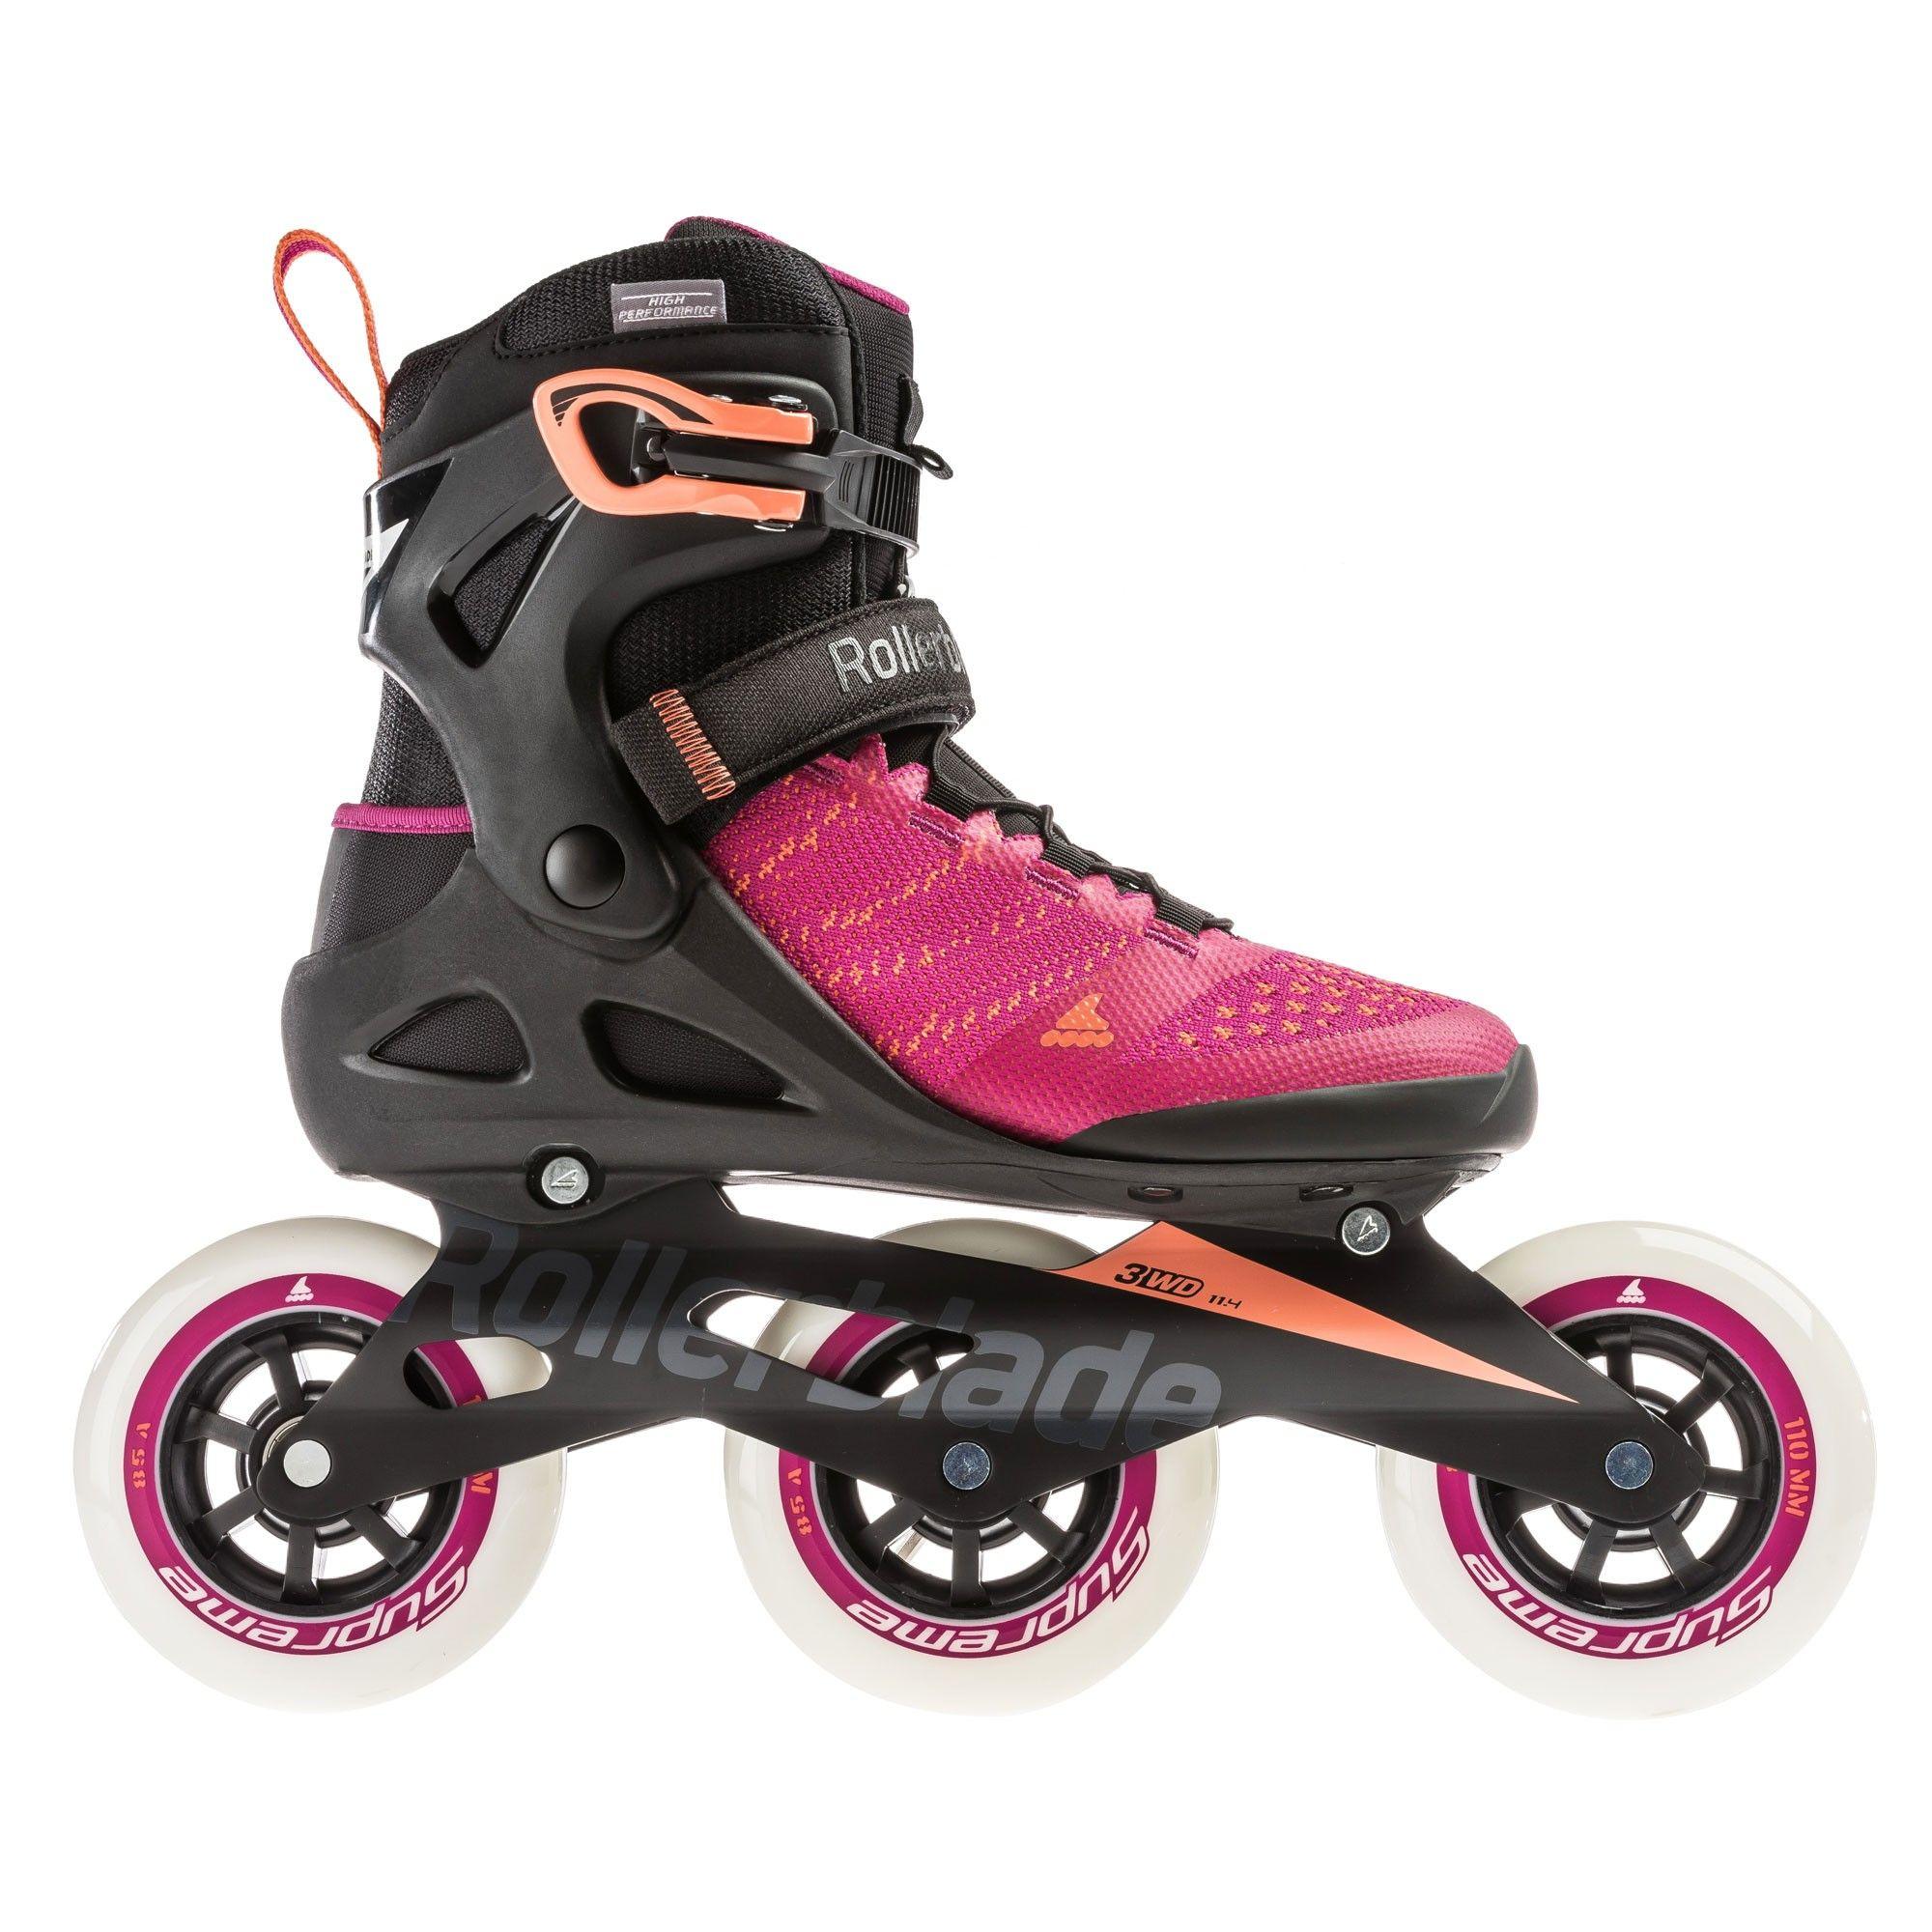 Women's 110 3WD Skates Rollerblade Inline Macroblade NnPX8wk0O